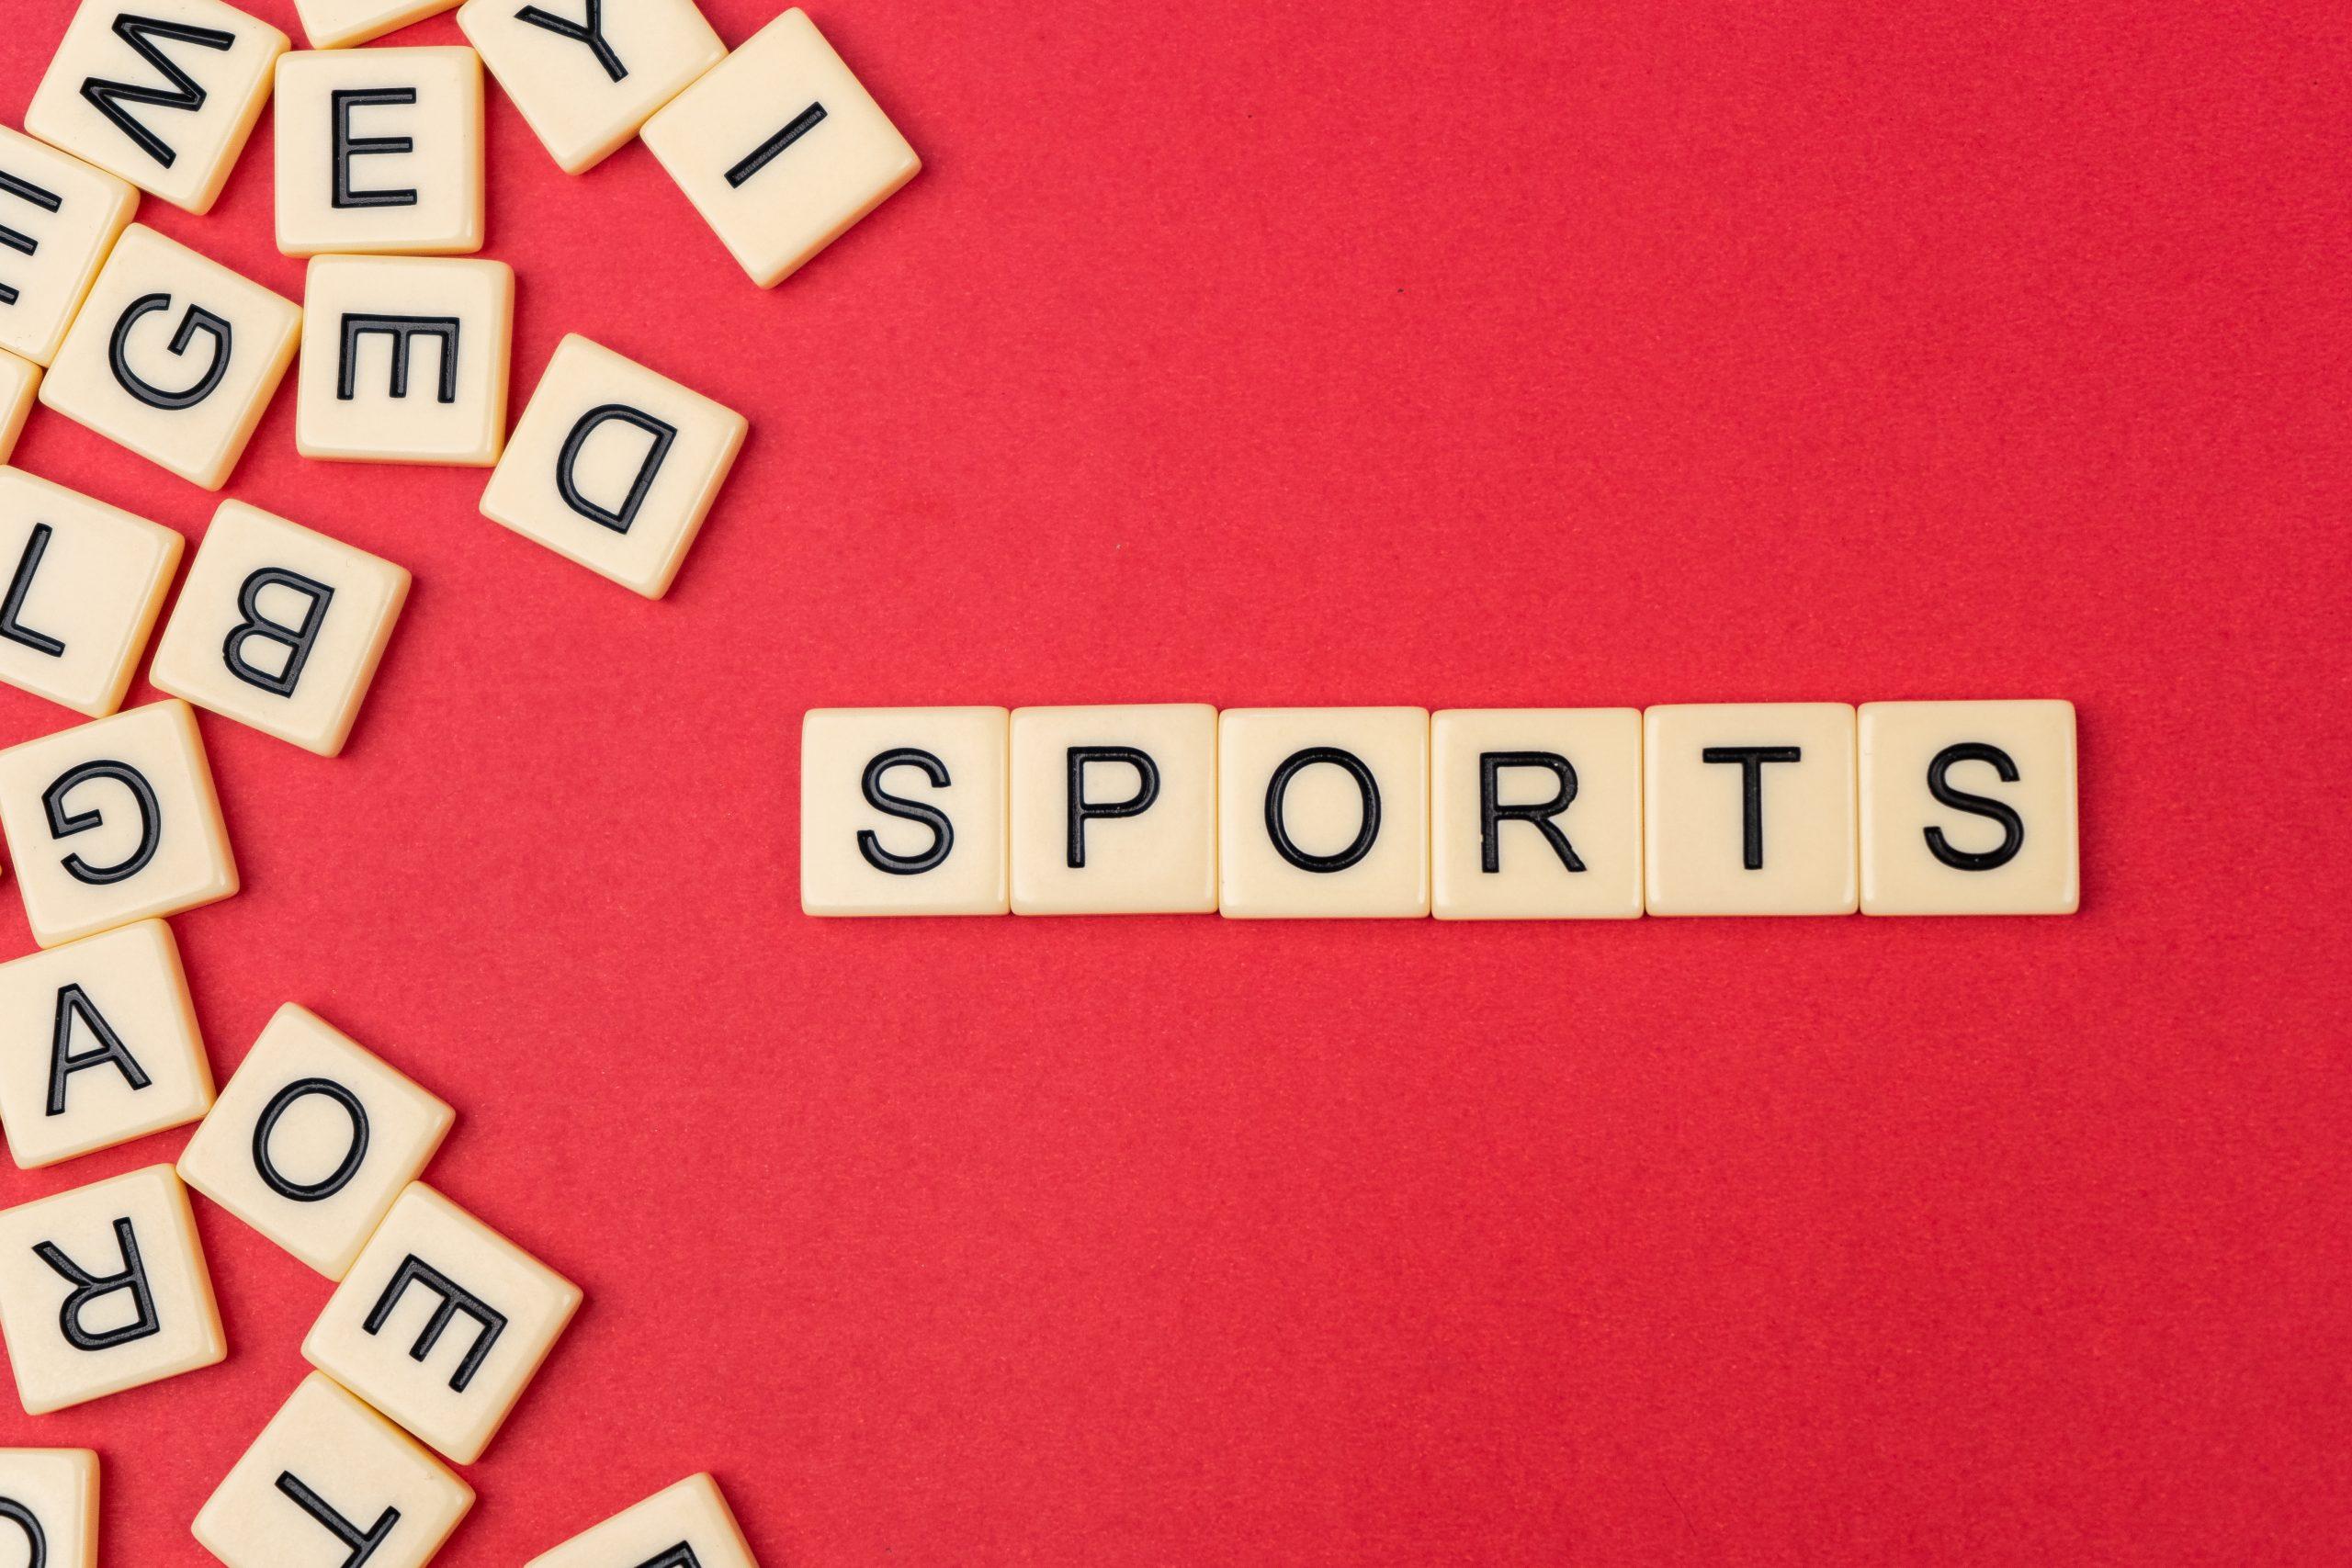 Sports written with scrabble